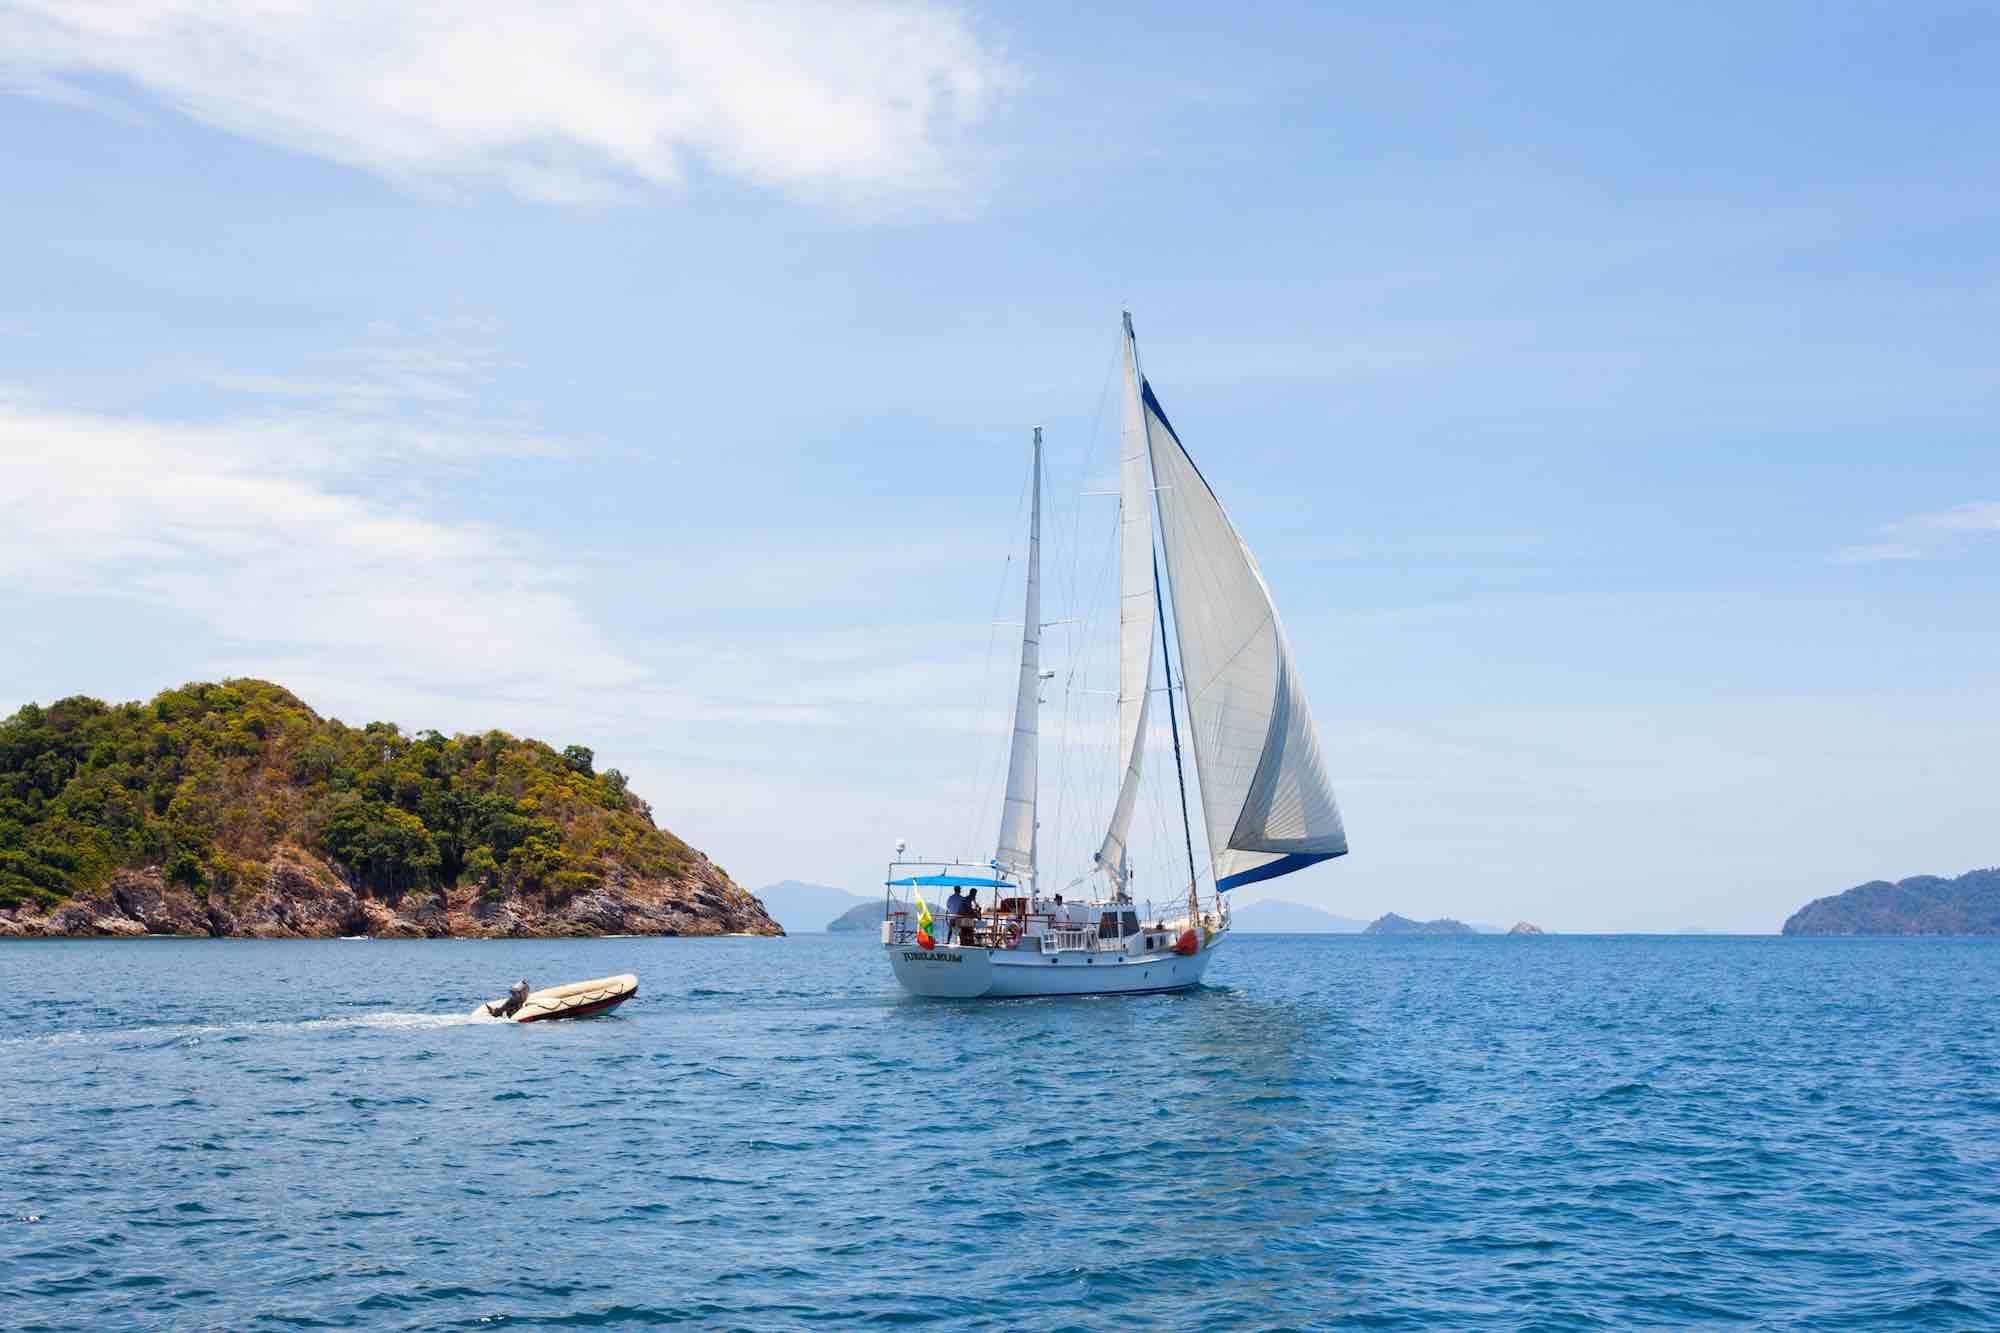 Jubilaeum_sailing full sail away from an island-tender sailing around in Mergui_XS.jpeg